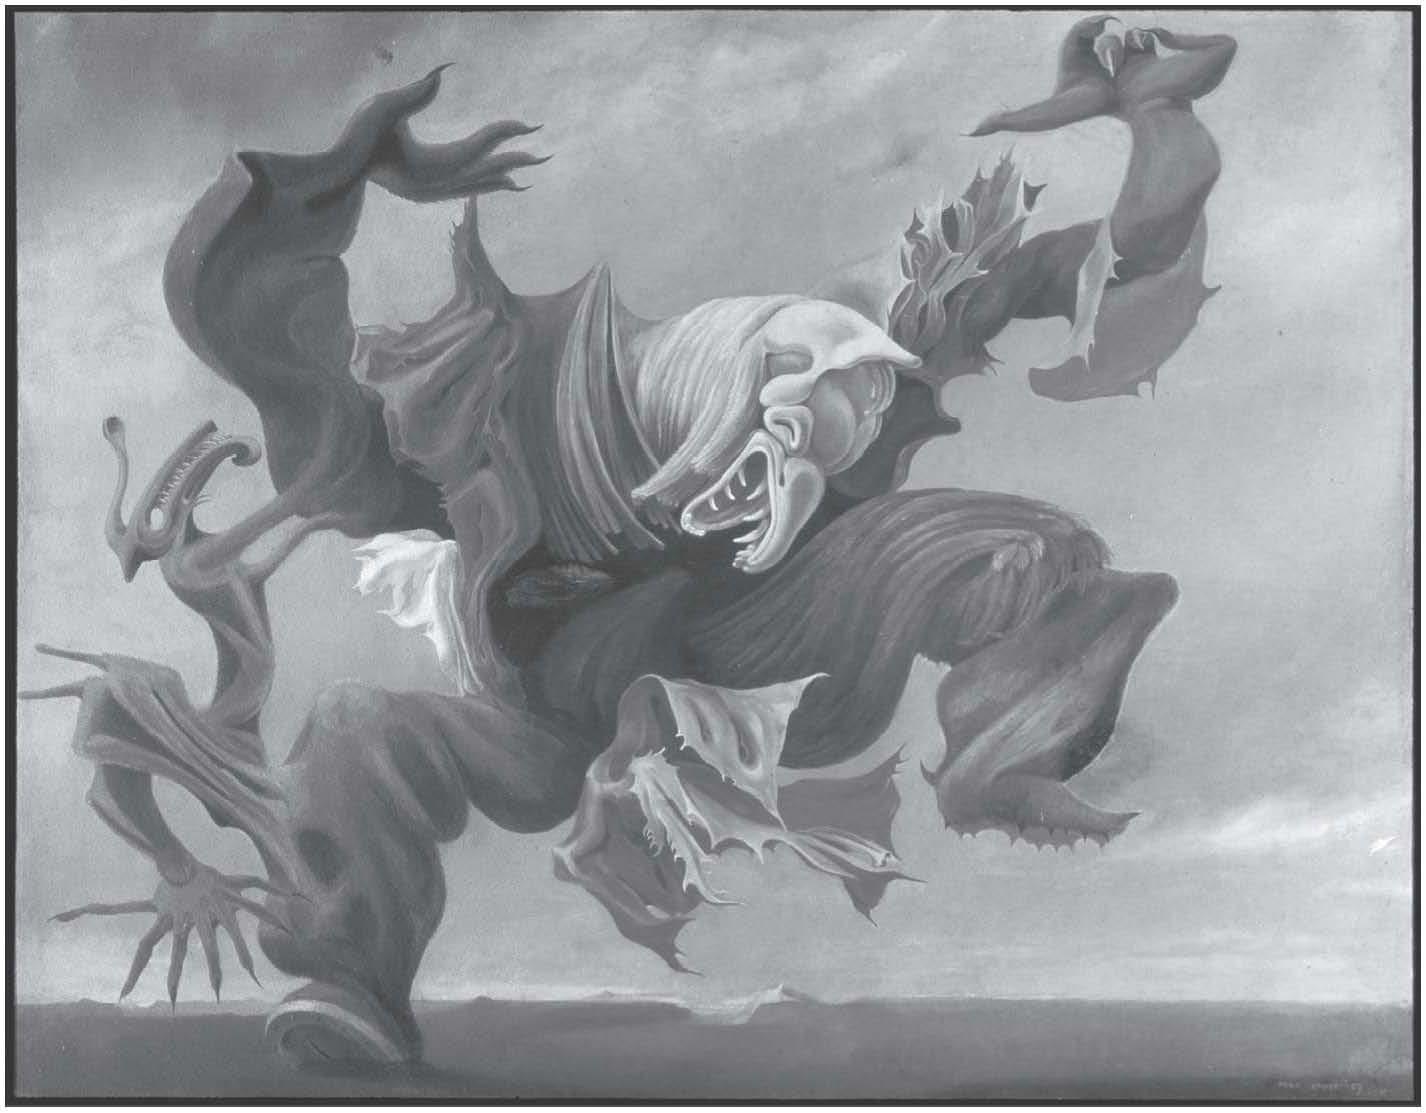 David Smith - Medals for Dishonor (1936-40) - 4 Der ikonografische ...